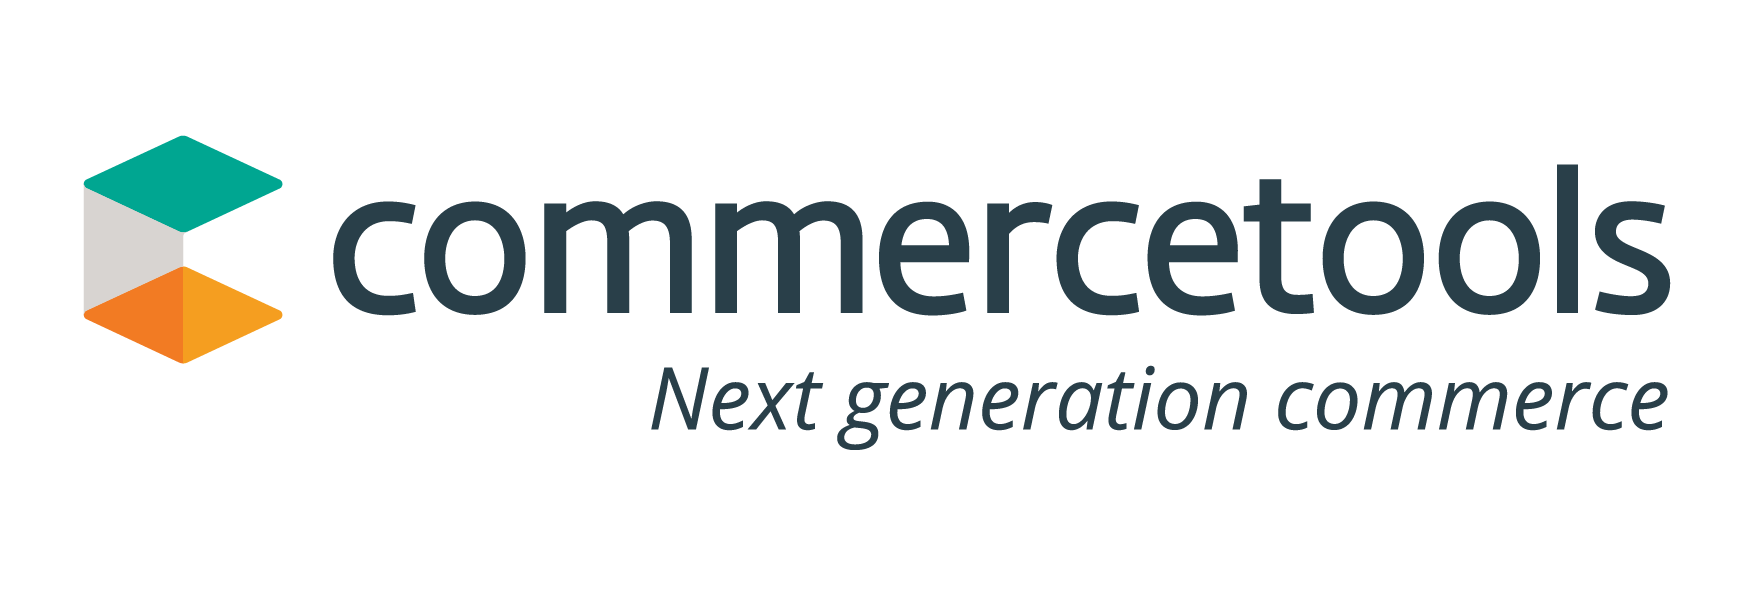 Headless Wins Gartner's Support, as commercetools Is Recognised as a 'Leader' in The 2020 Gartner Magic Quadrant for Digital Commerce Report